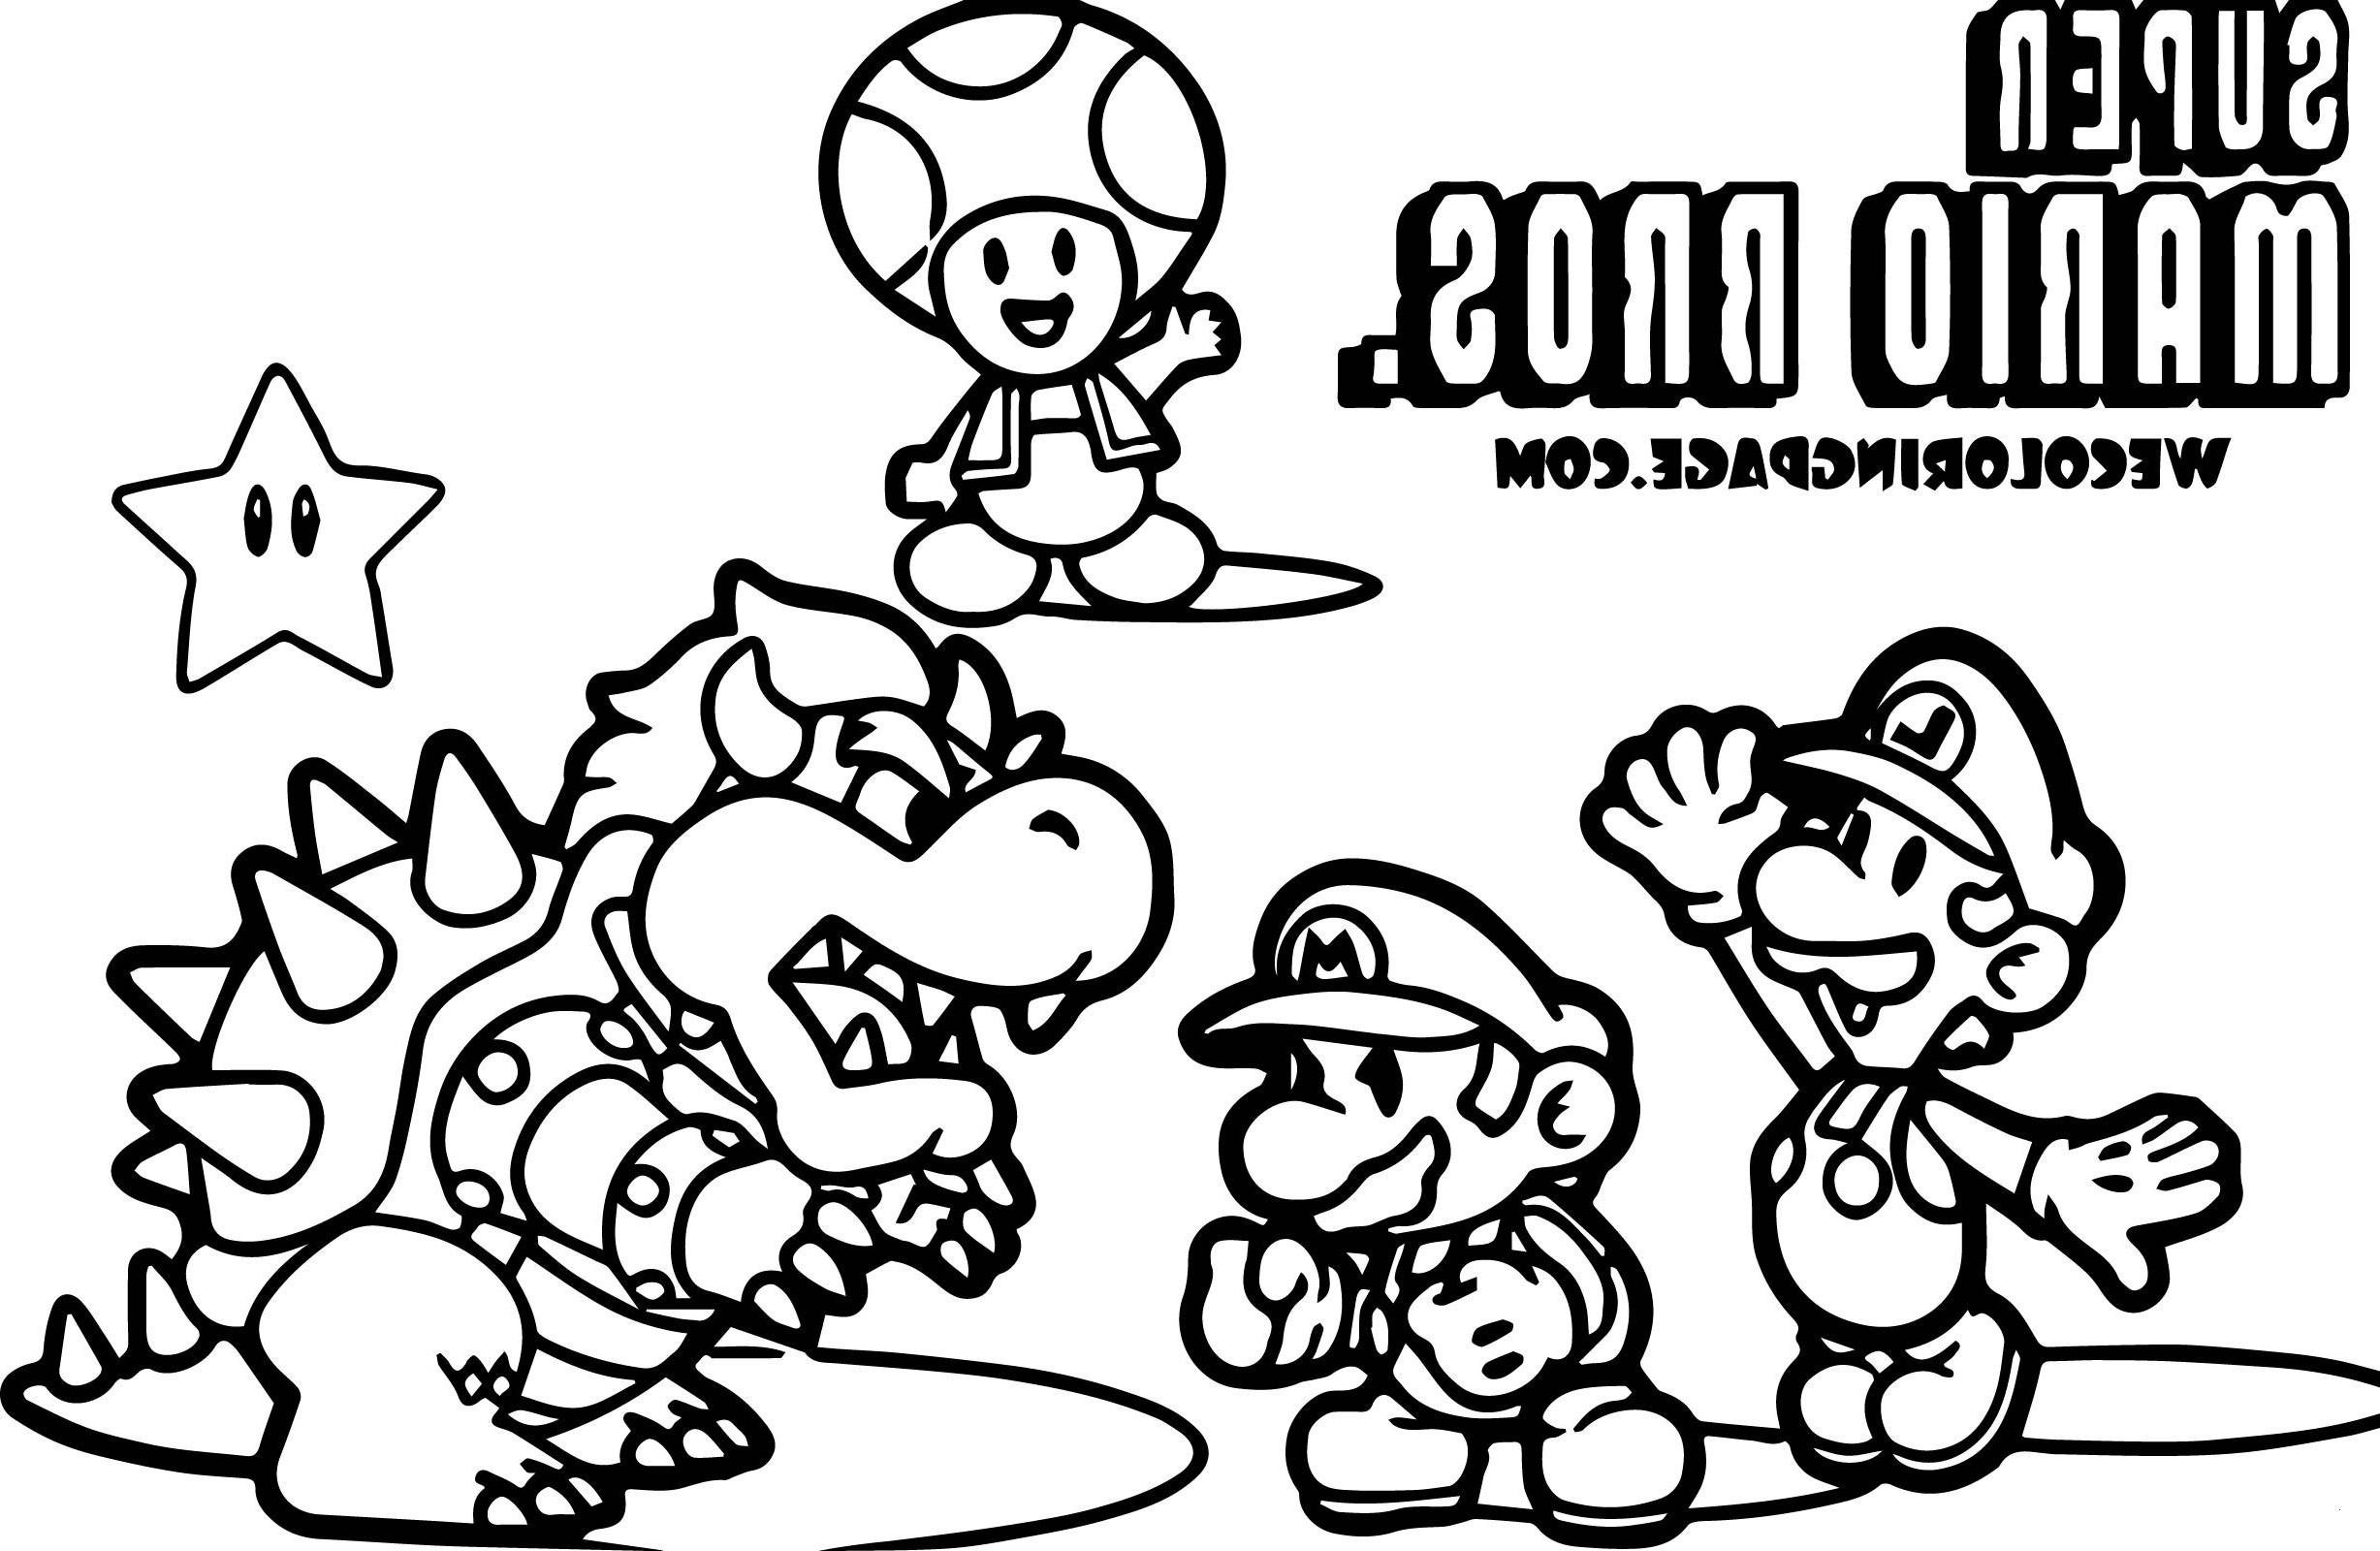 Ausmalbild Super Mario Genial 28 Inspirierend Ausmalbild Super Mario – Malvorlagen Ideen Bilder